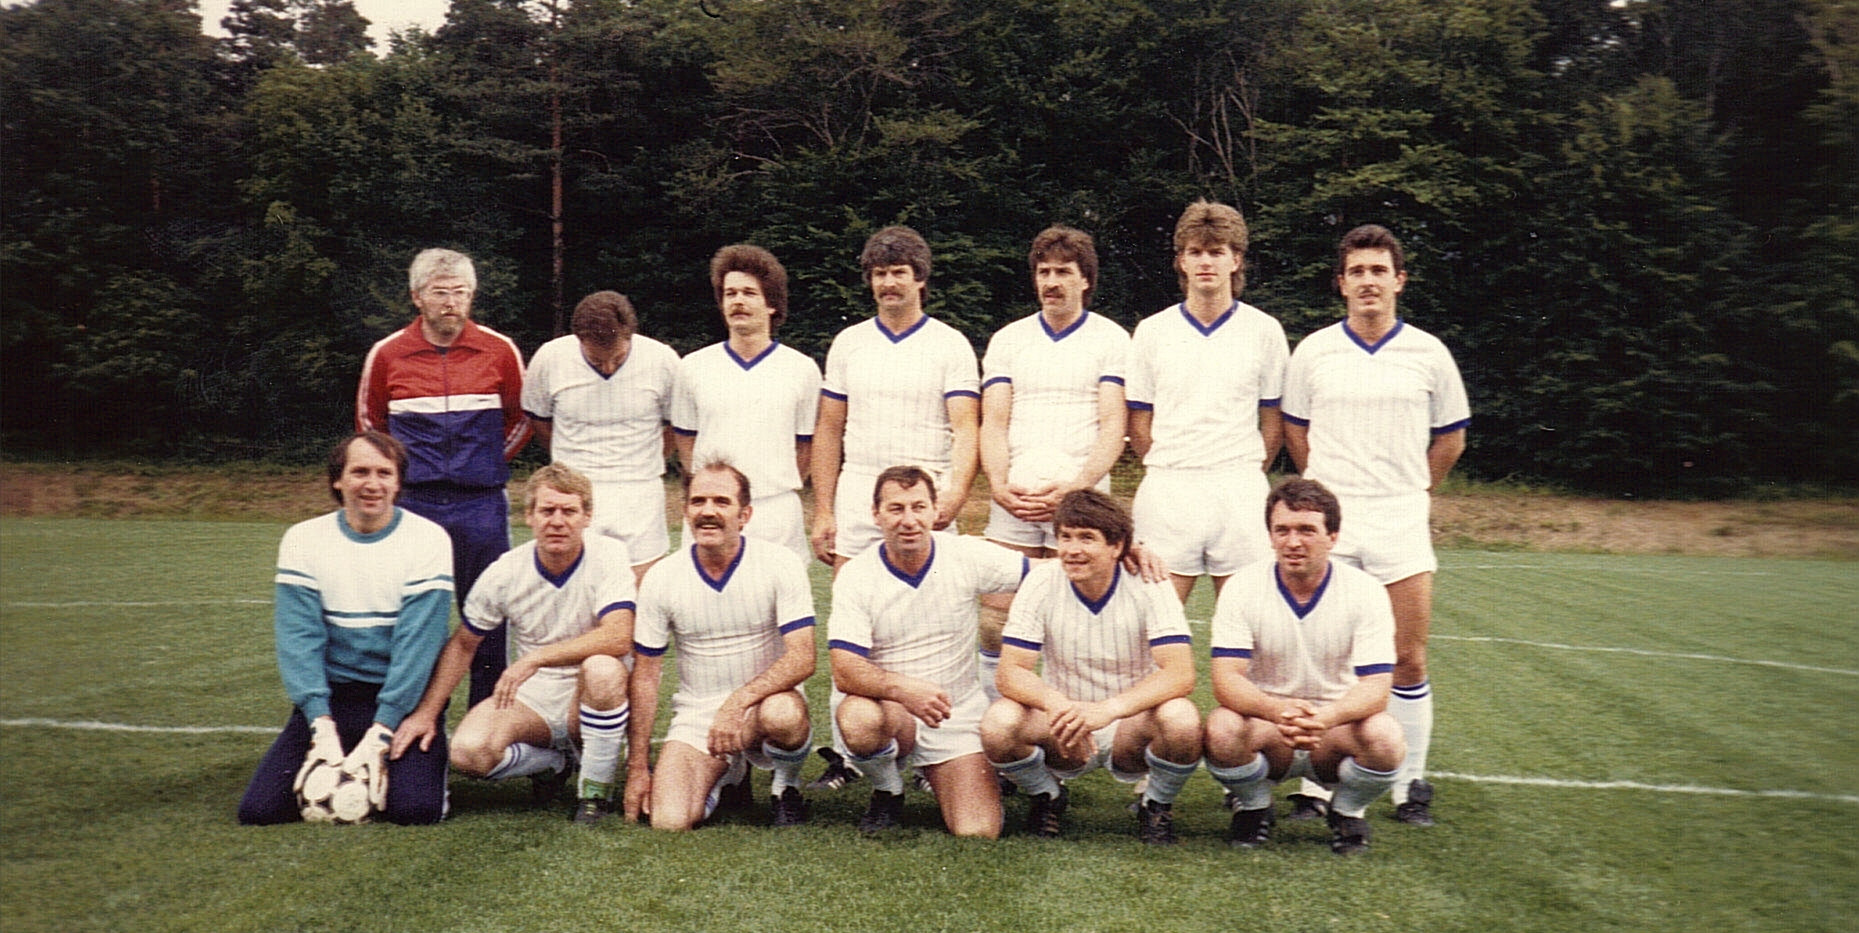 1987 Wiestental v Caldicot.jpg